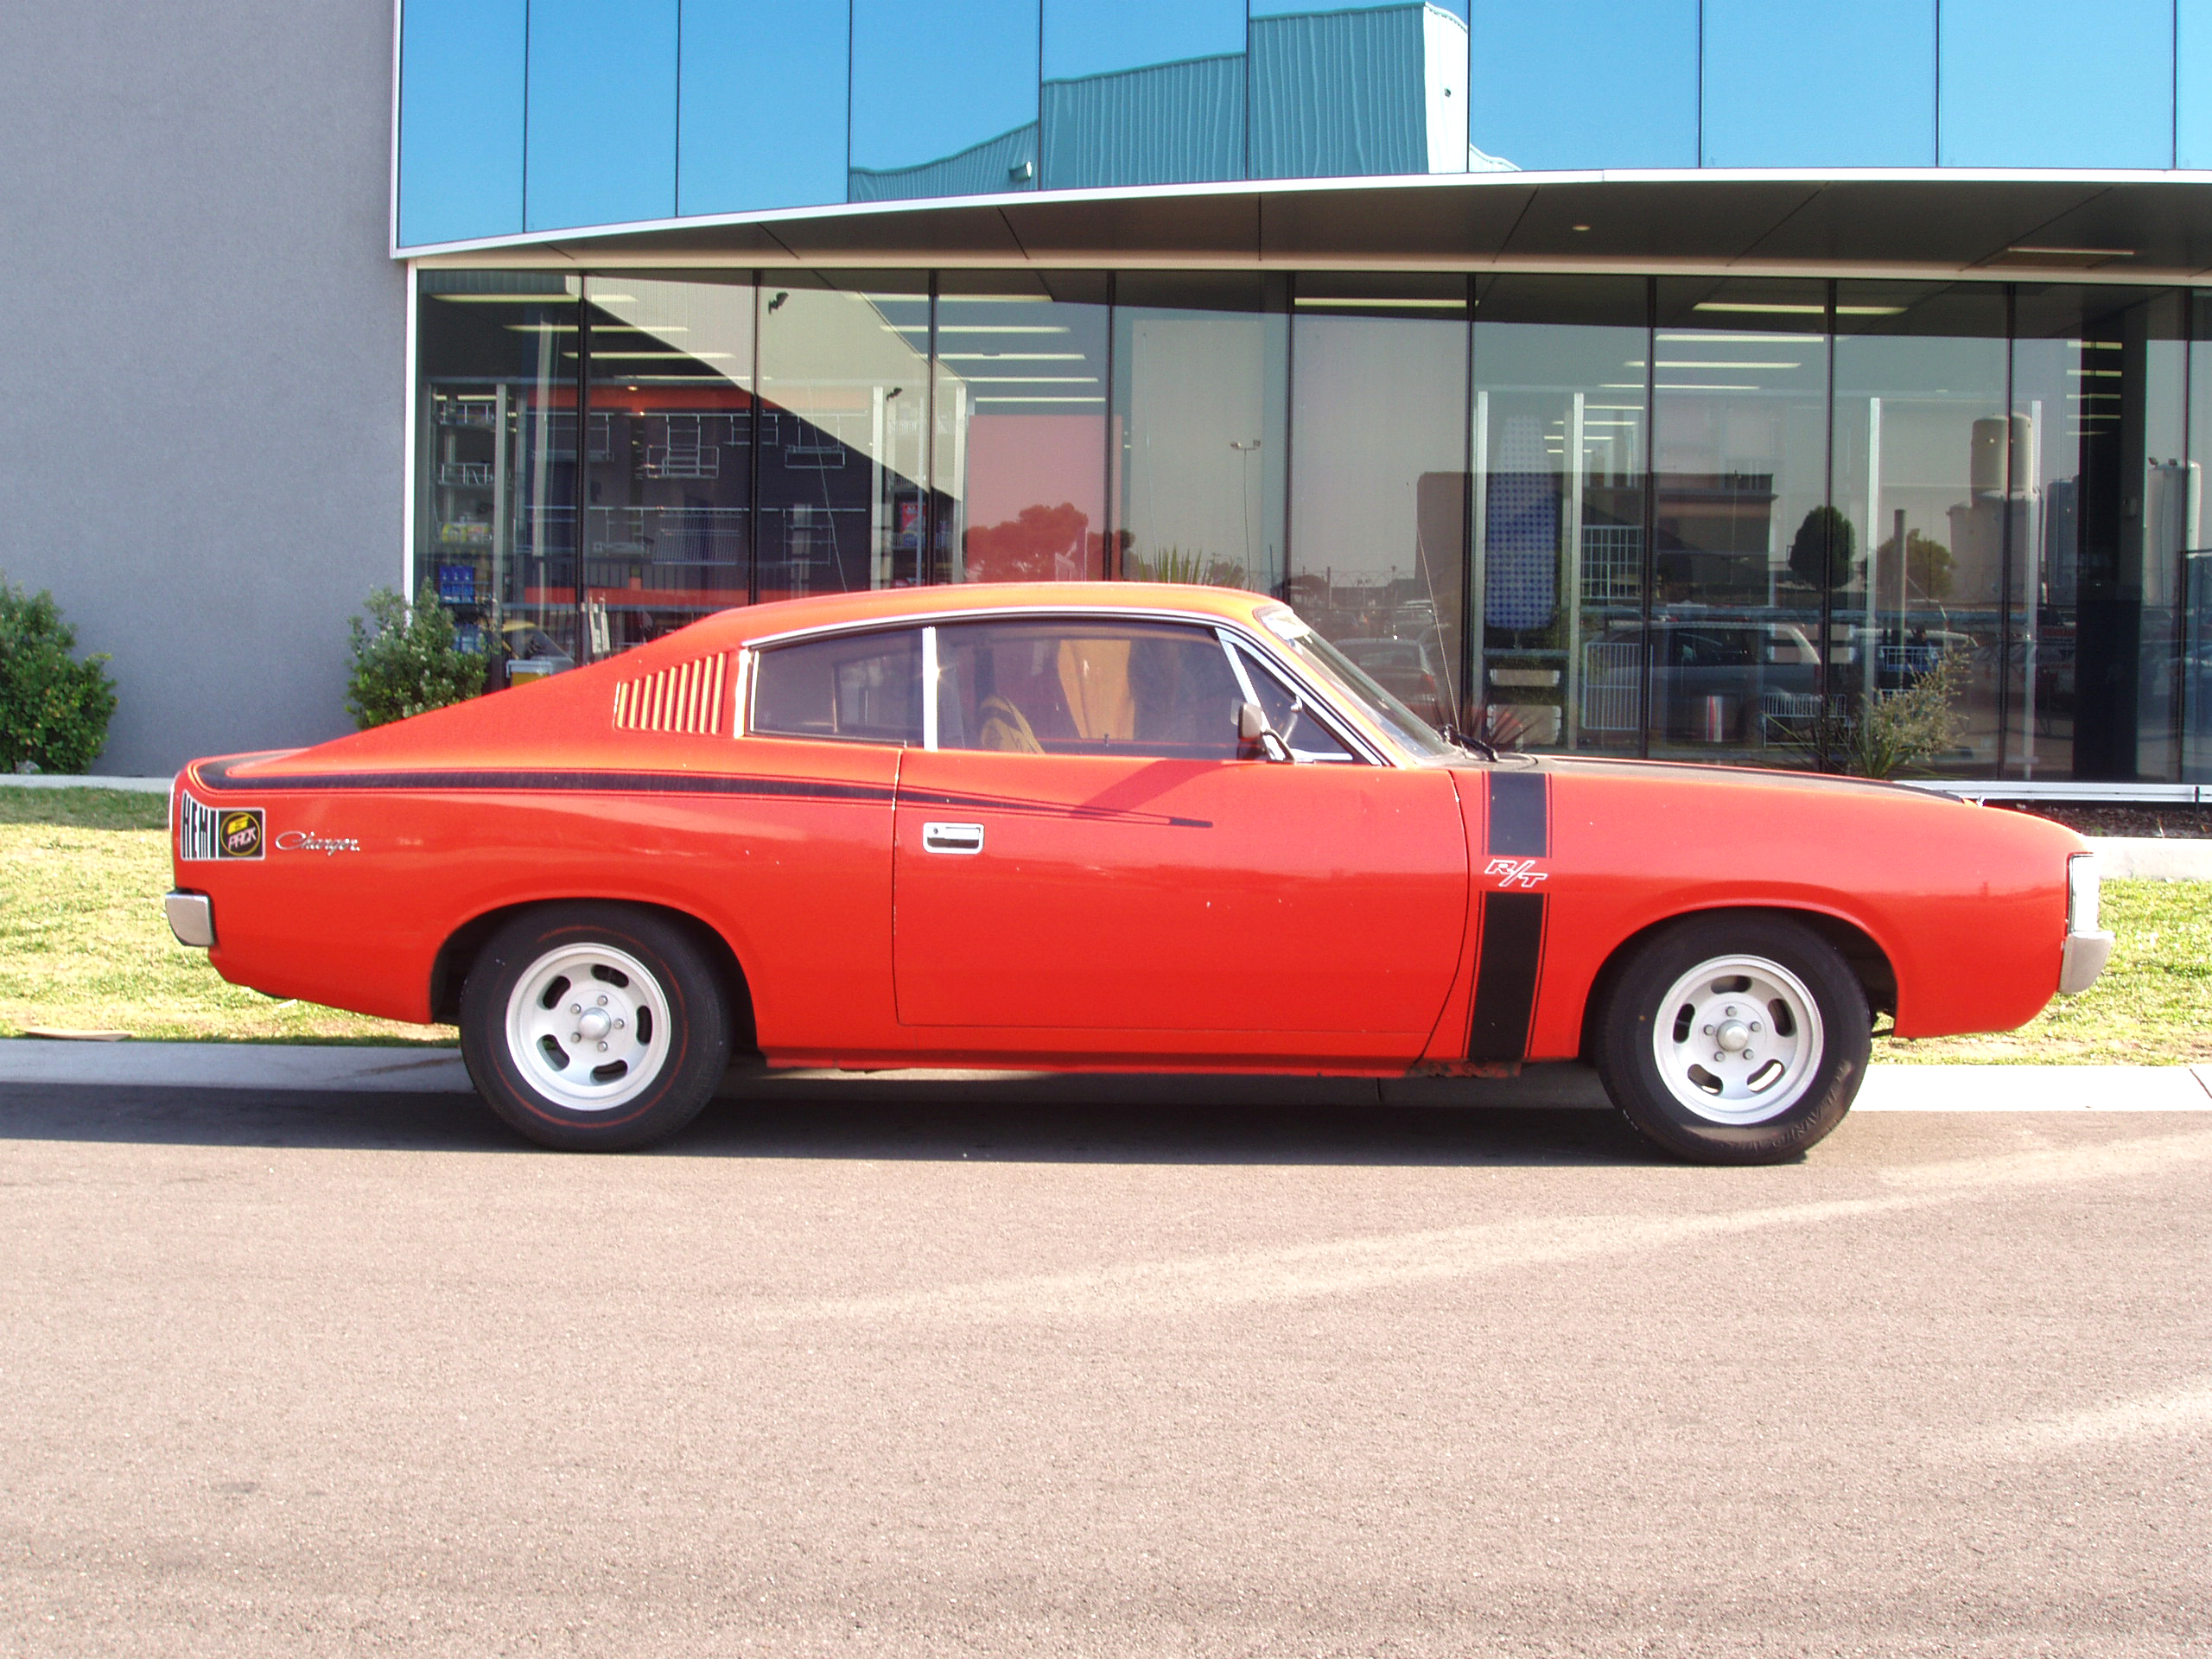 Chrysler Valiant Charger - Wikipedia